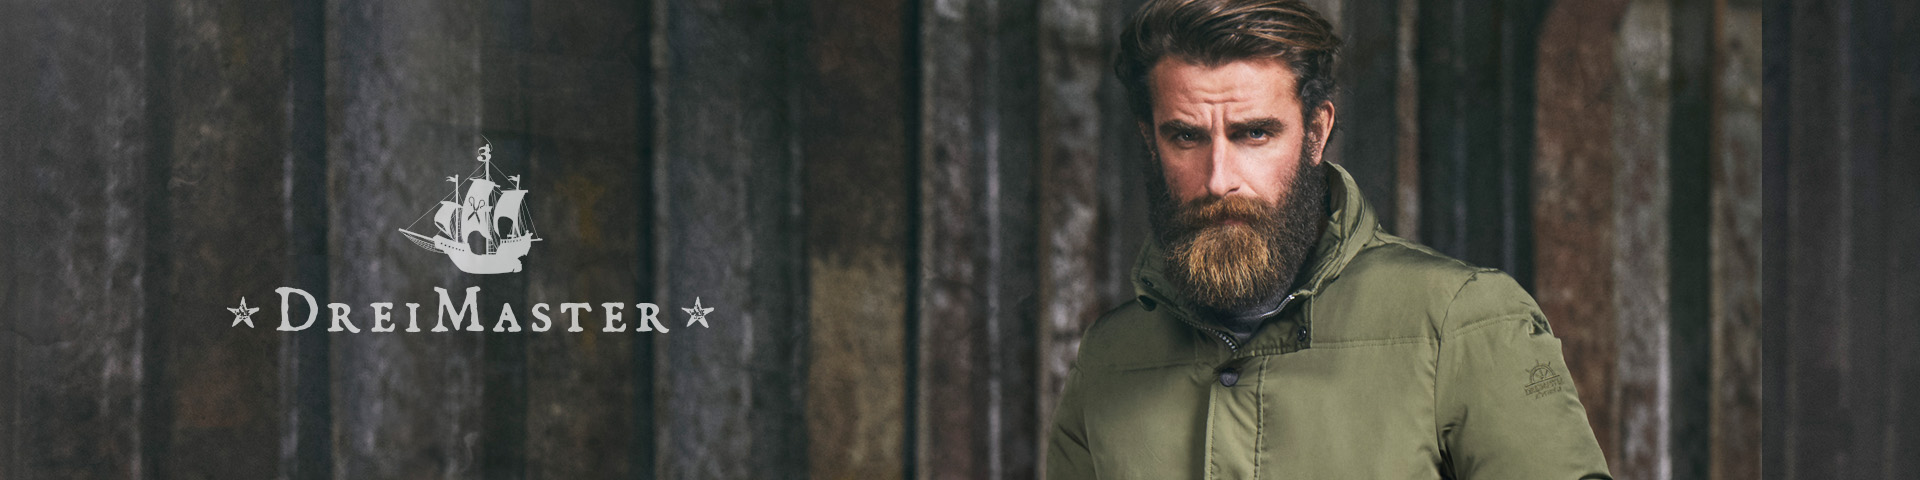 Dreimaster Mens Clothing Stylish Menswear Zalando Fiction Blouse With Obi Off White From